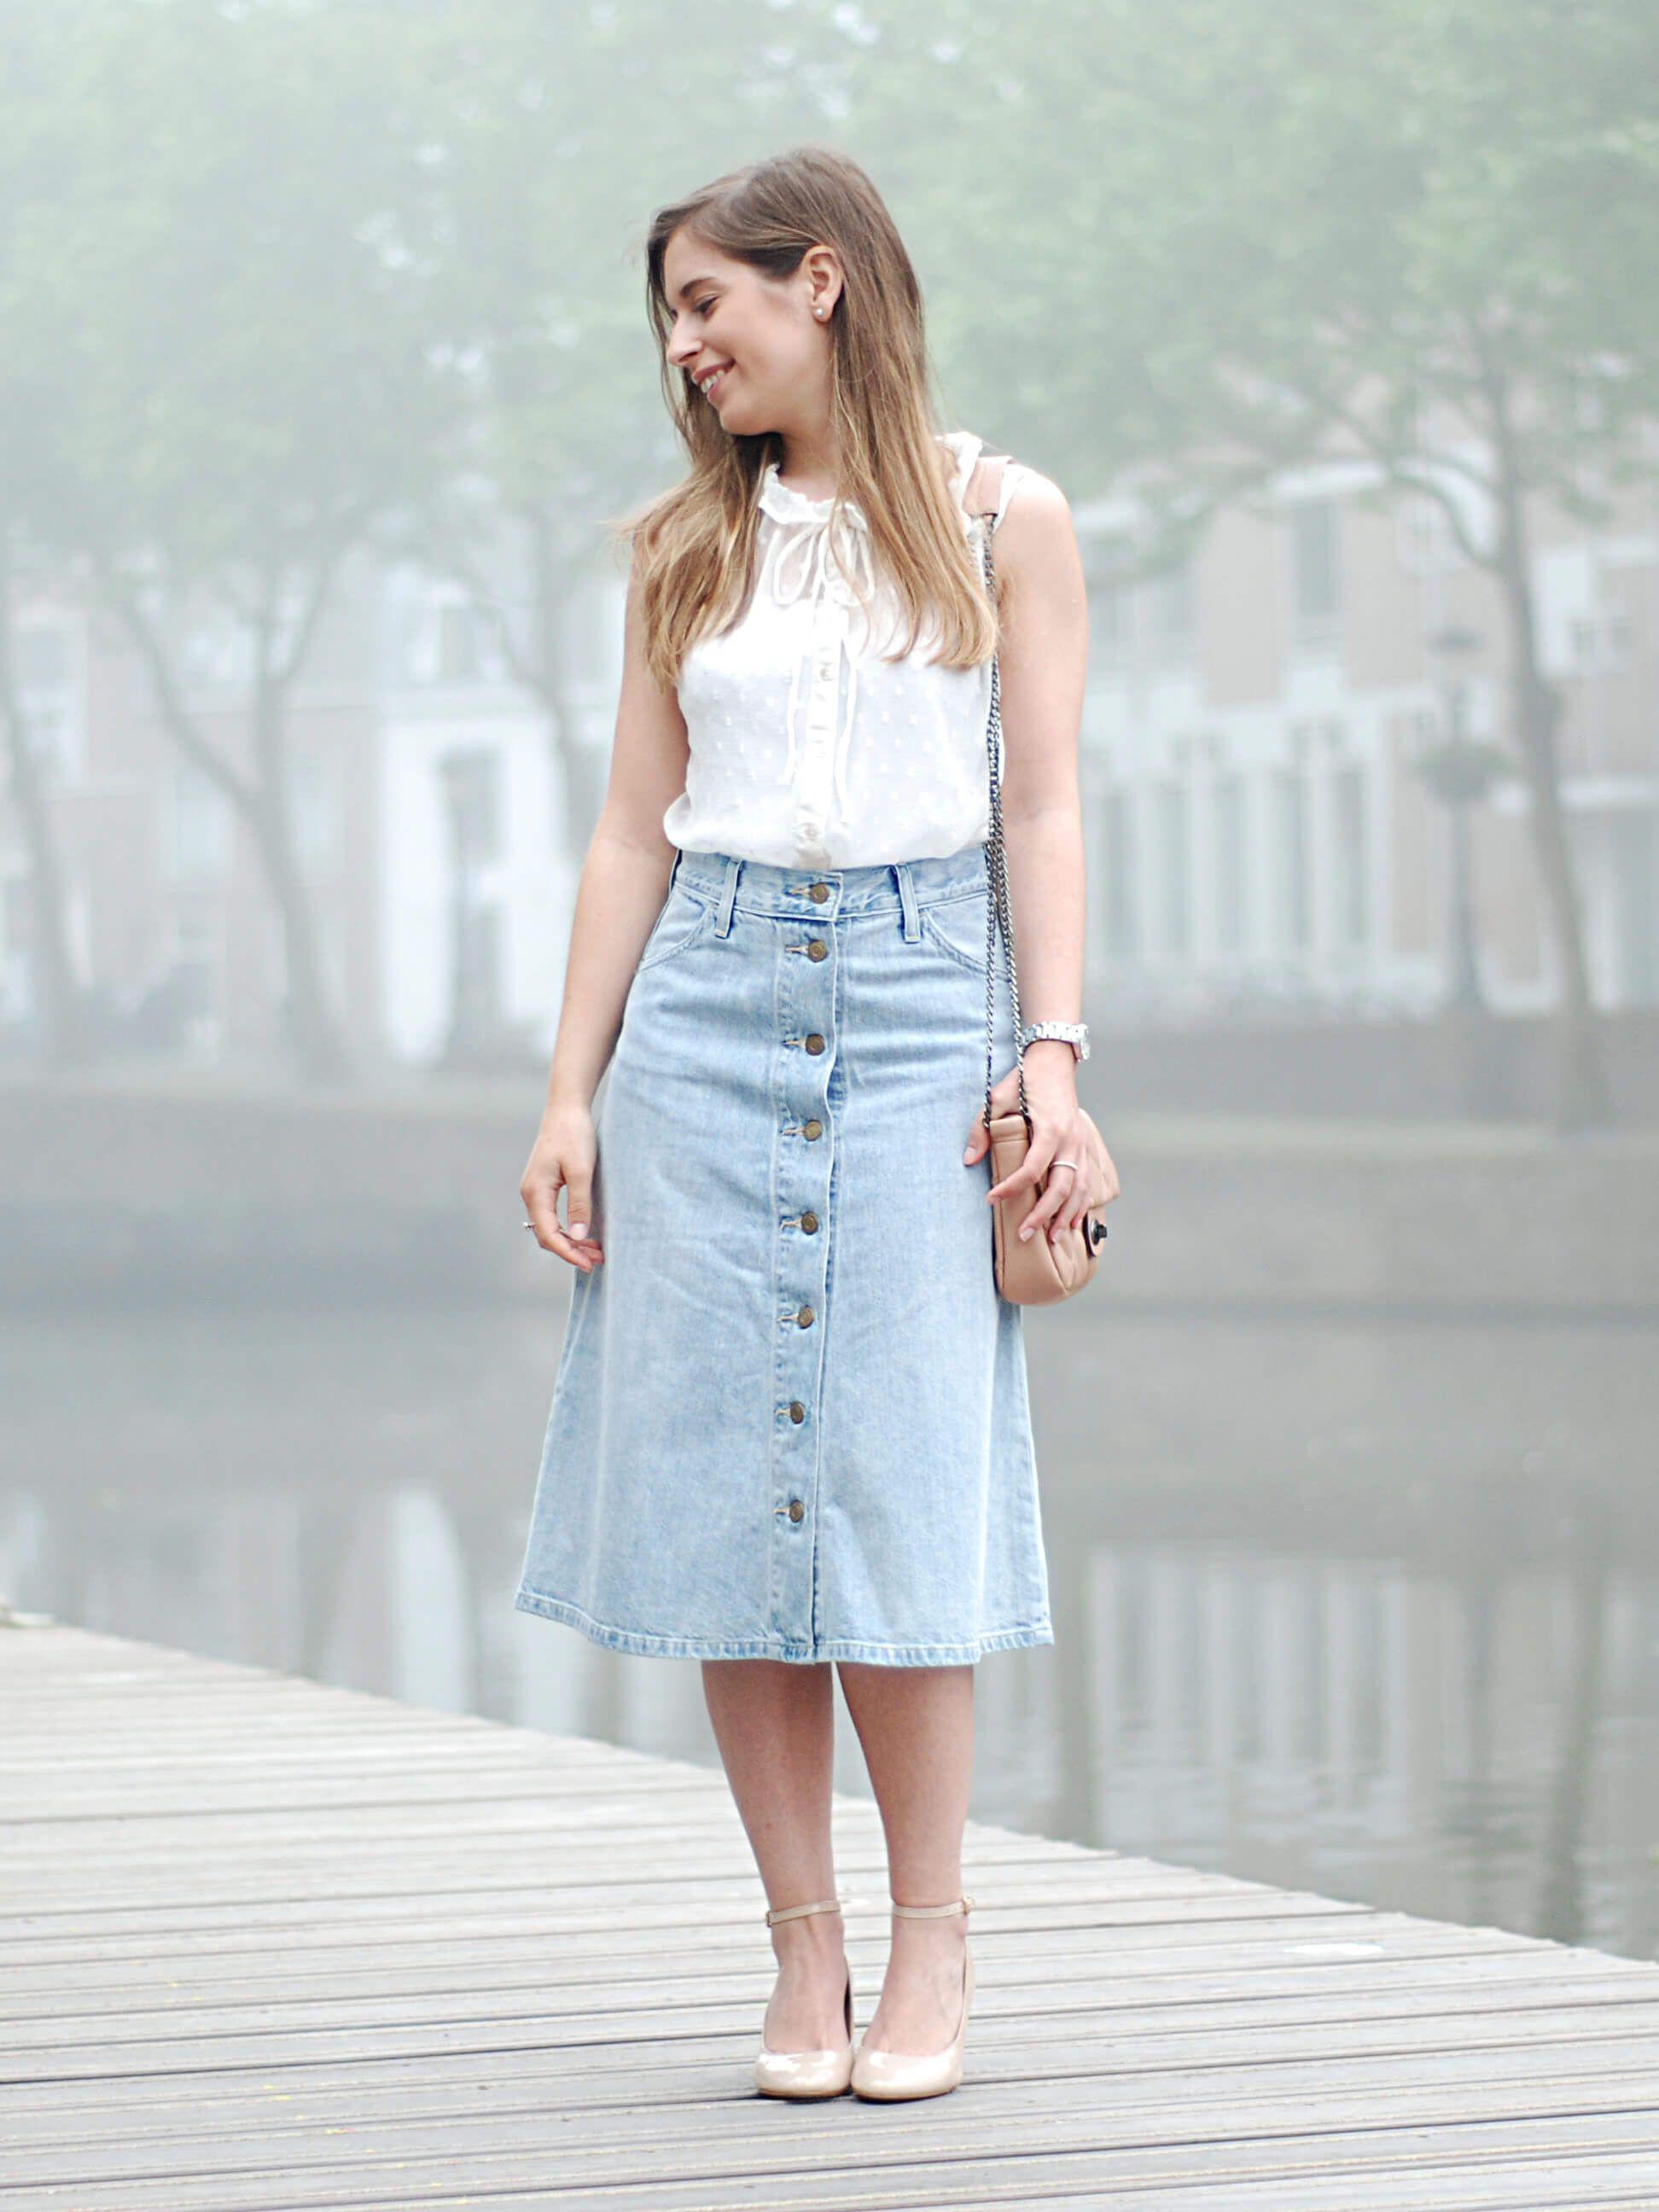 546a7b82a Midi denim skirt, ruffle blouse and block heels by The petite Cat ...